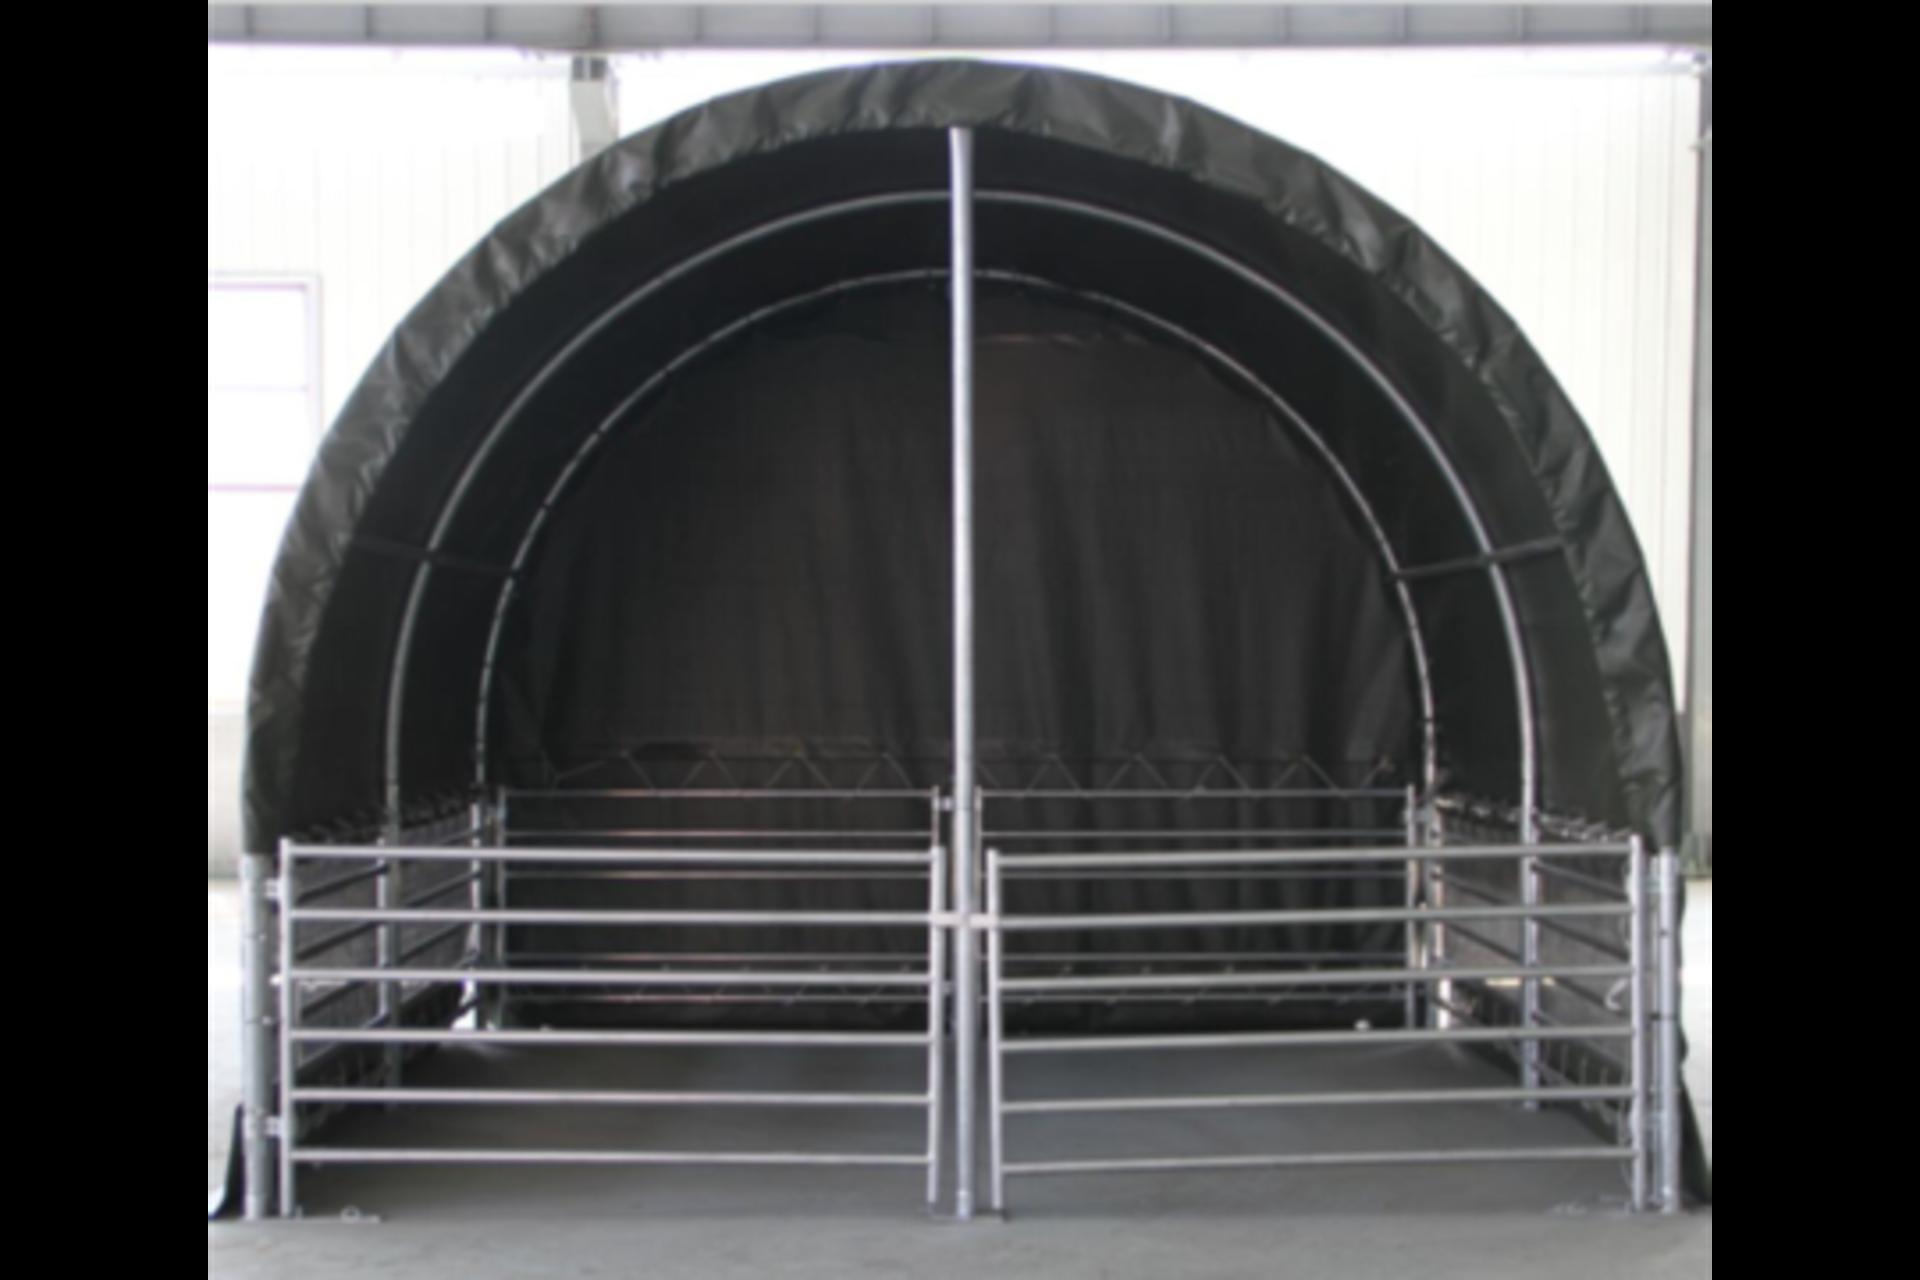 Lot 280 - Heavy Duty Gated Livestock Shelter 13'W x 13'L x 10'H P/No LS1313